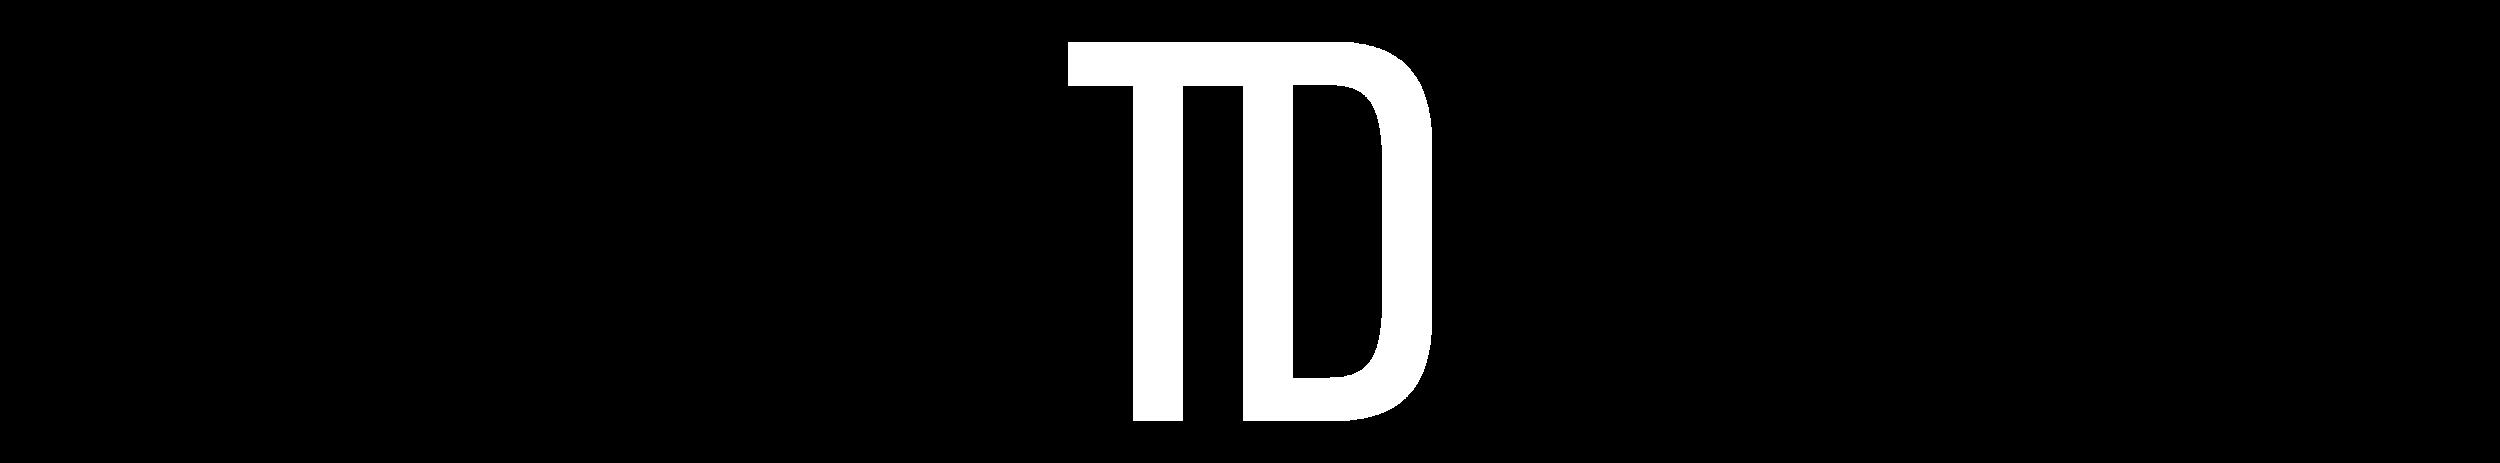 TD_LogoThomasDiehl.png